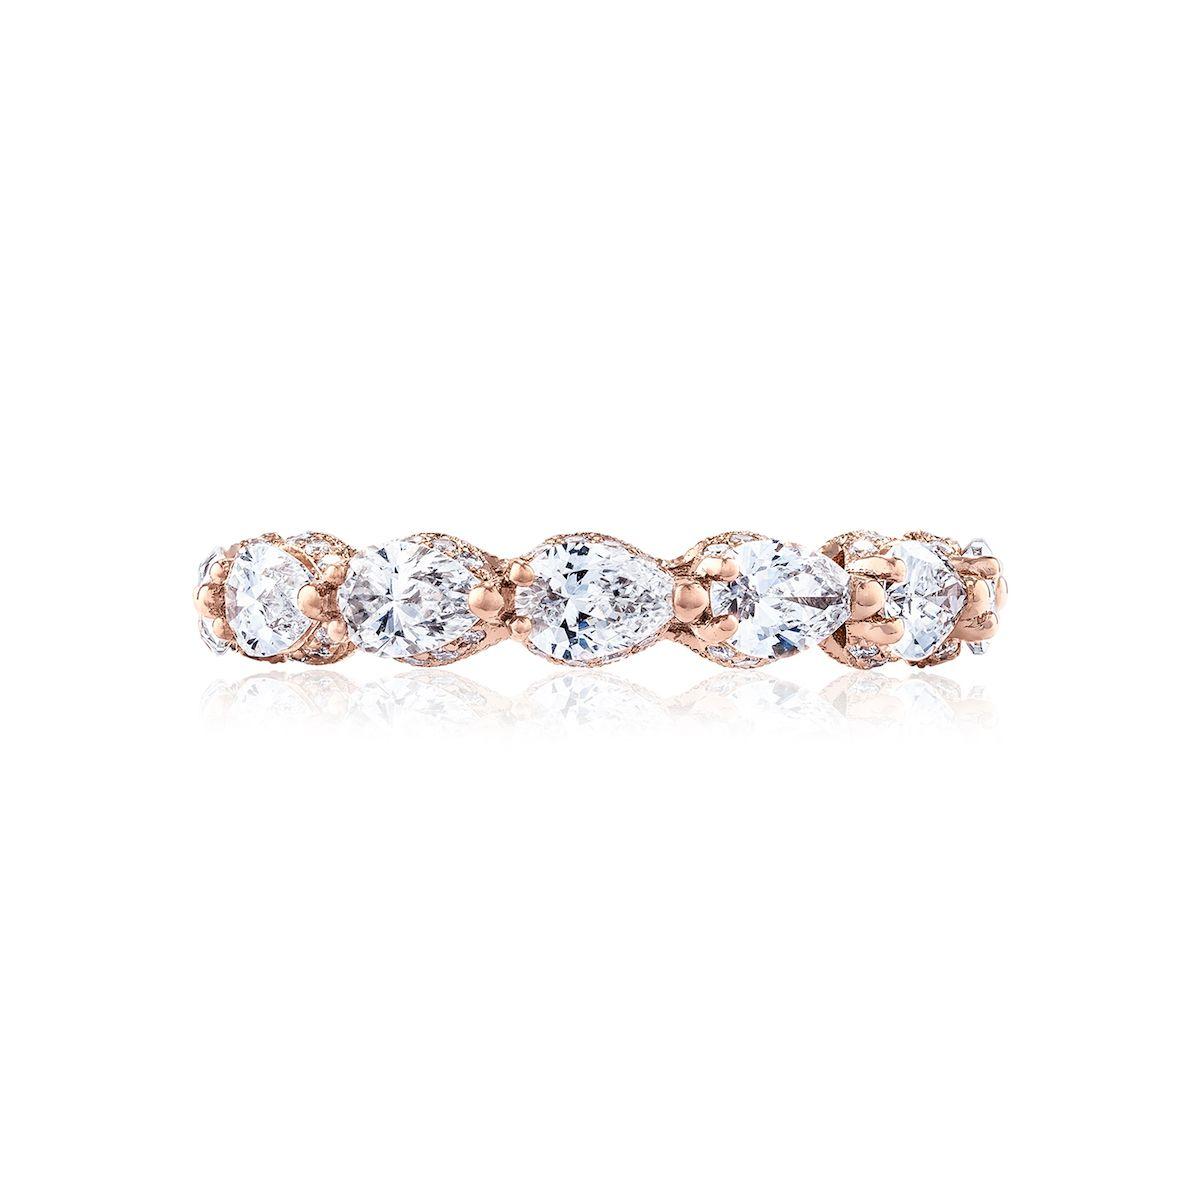 Tacori Royal T Pear Diamond Eternity Band in 18K Rose Gold